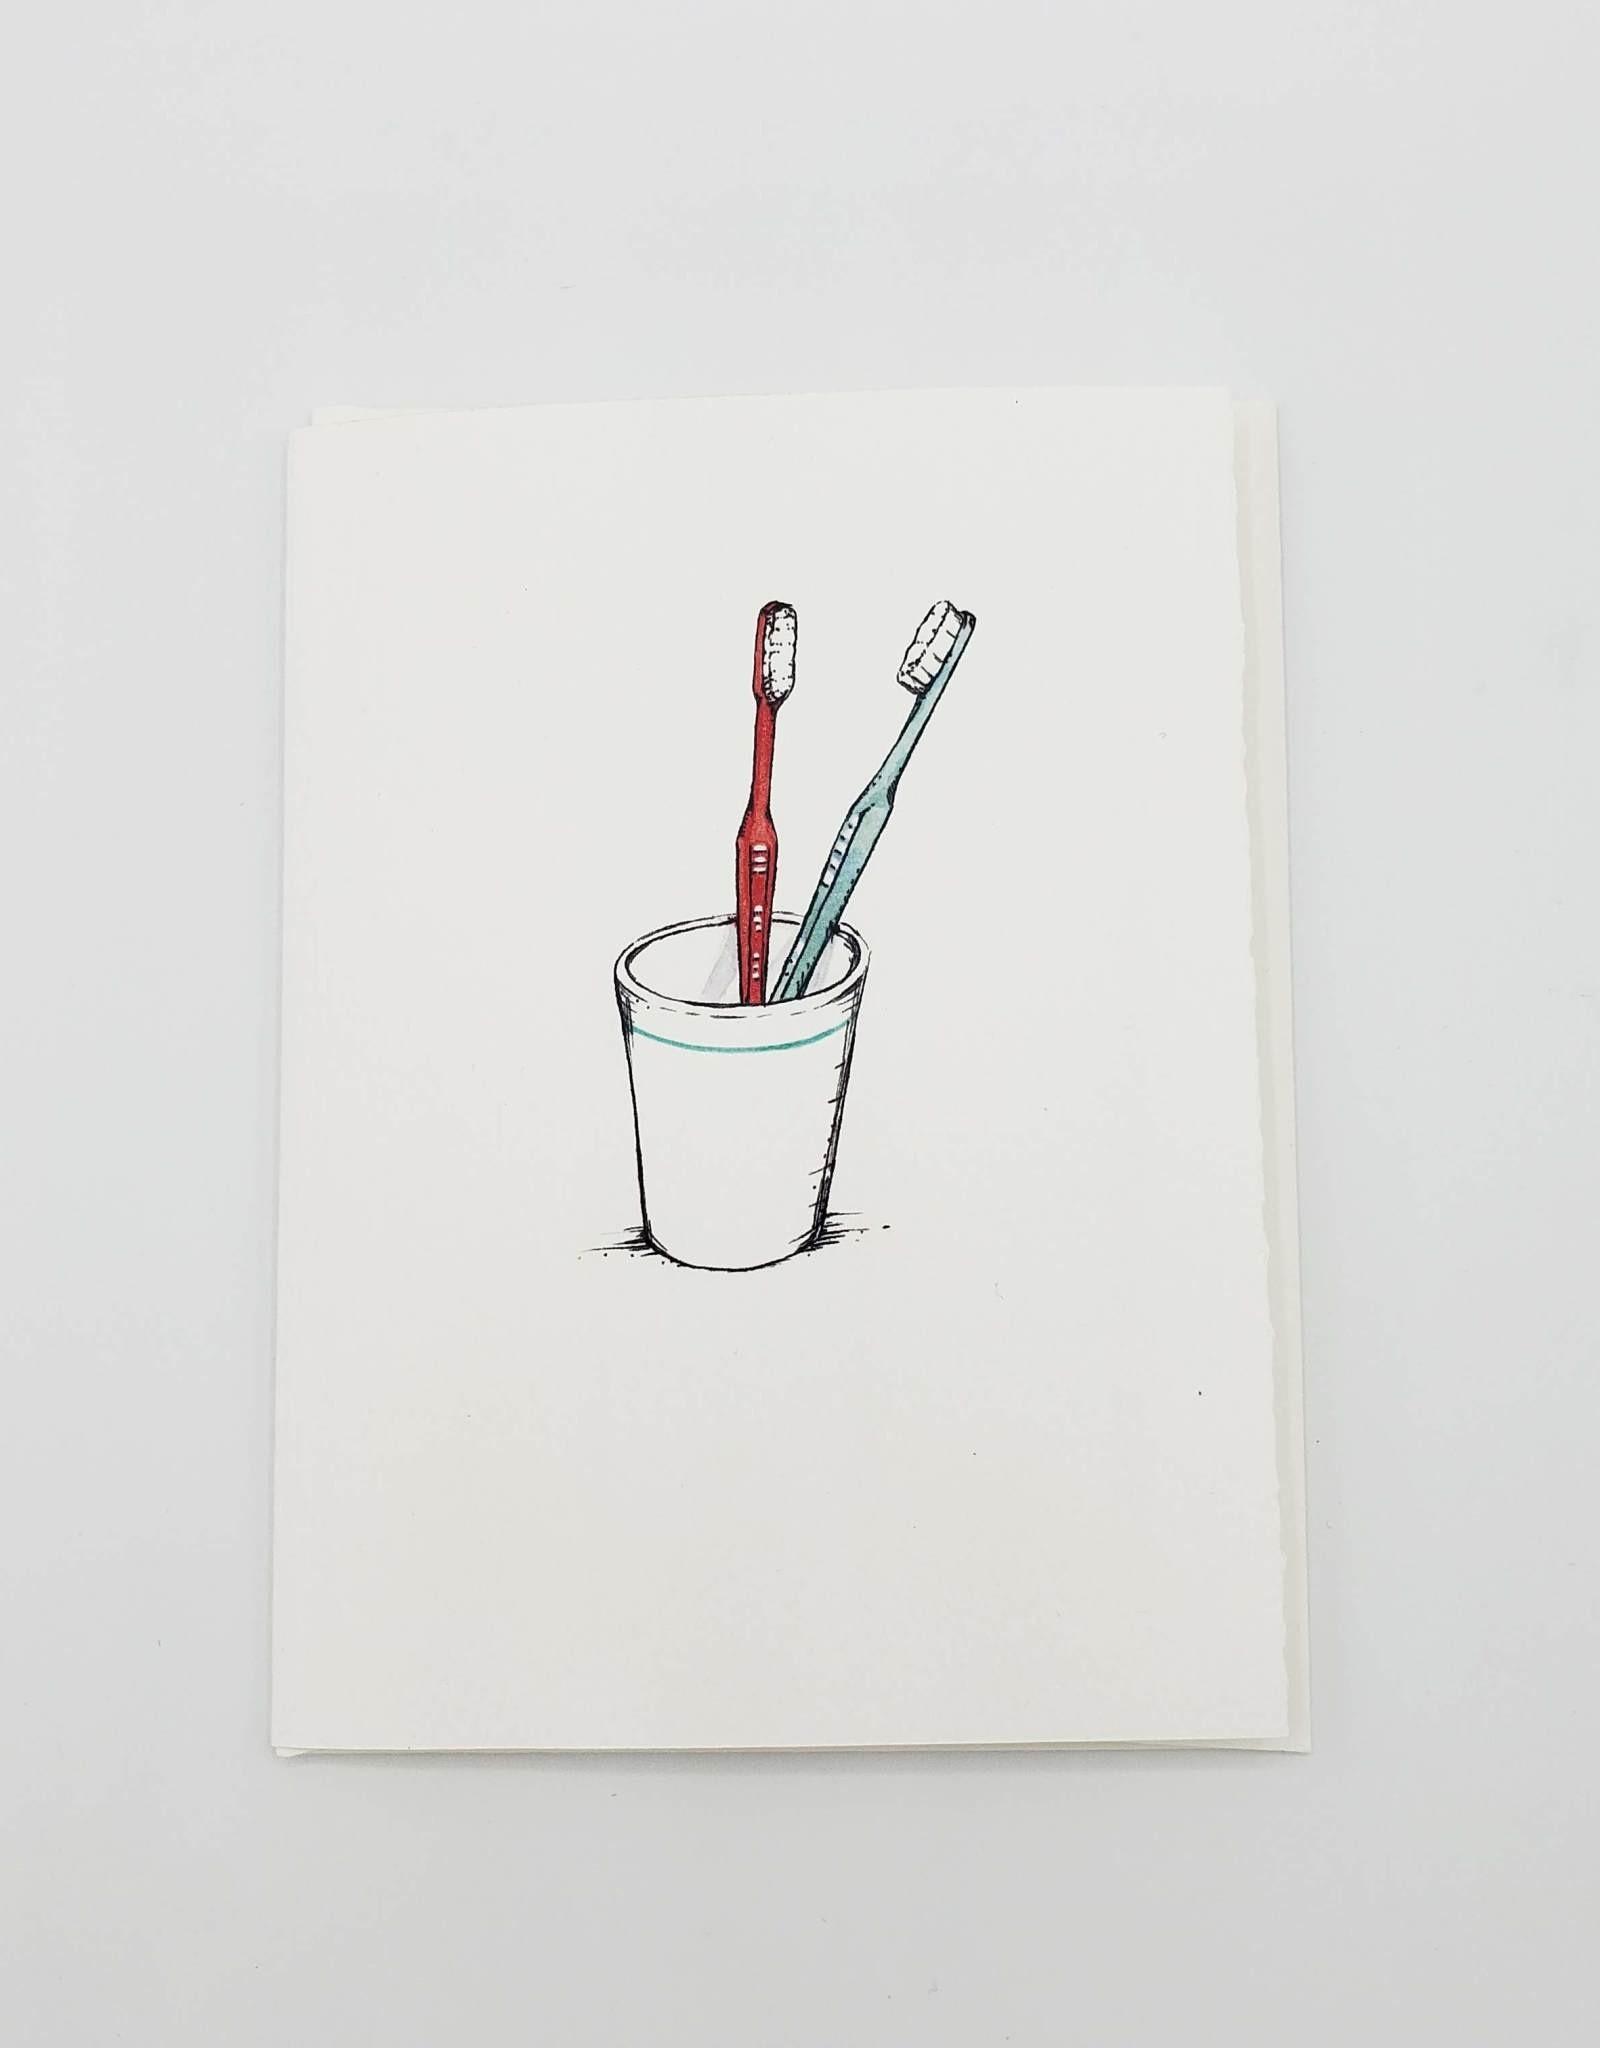 Toothbrushes Anniversary Greeting Card - Redbird Studio